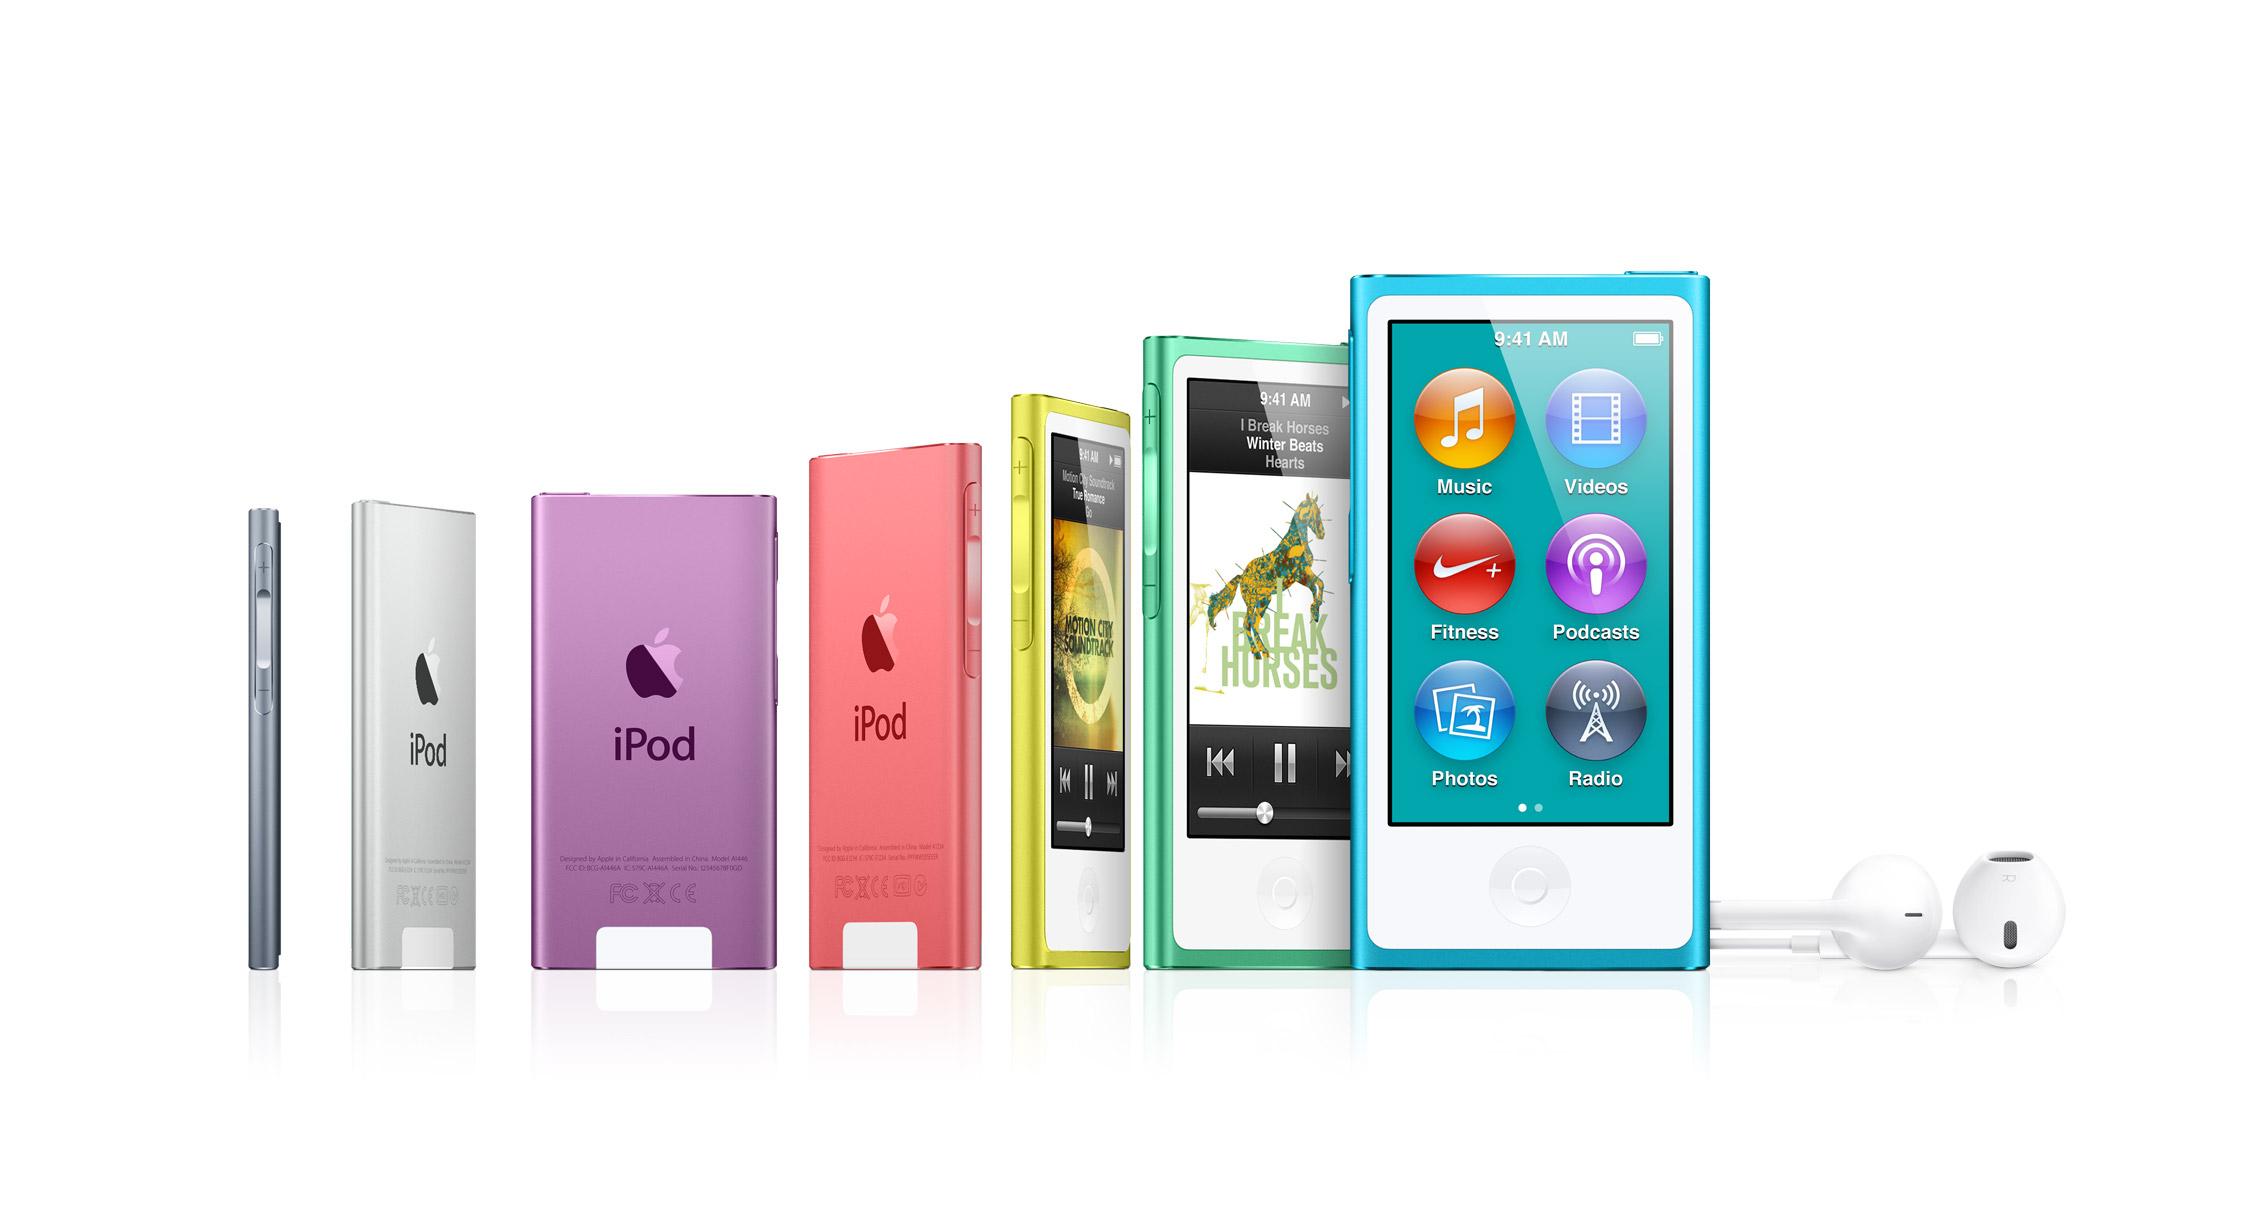 iPod Nano 7th Generation Range